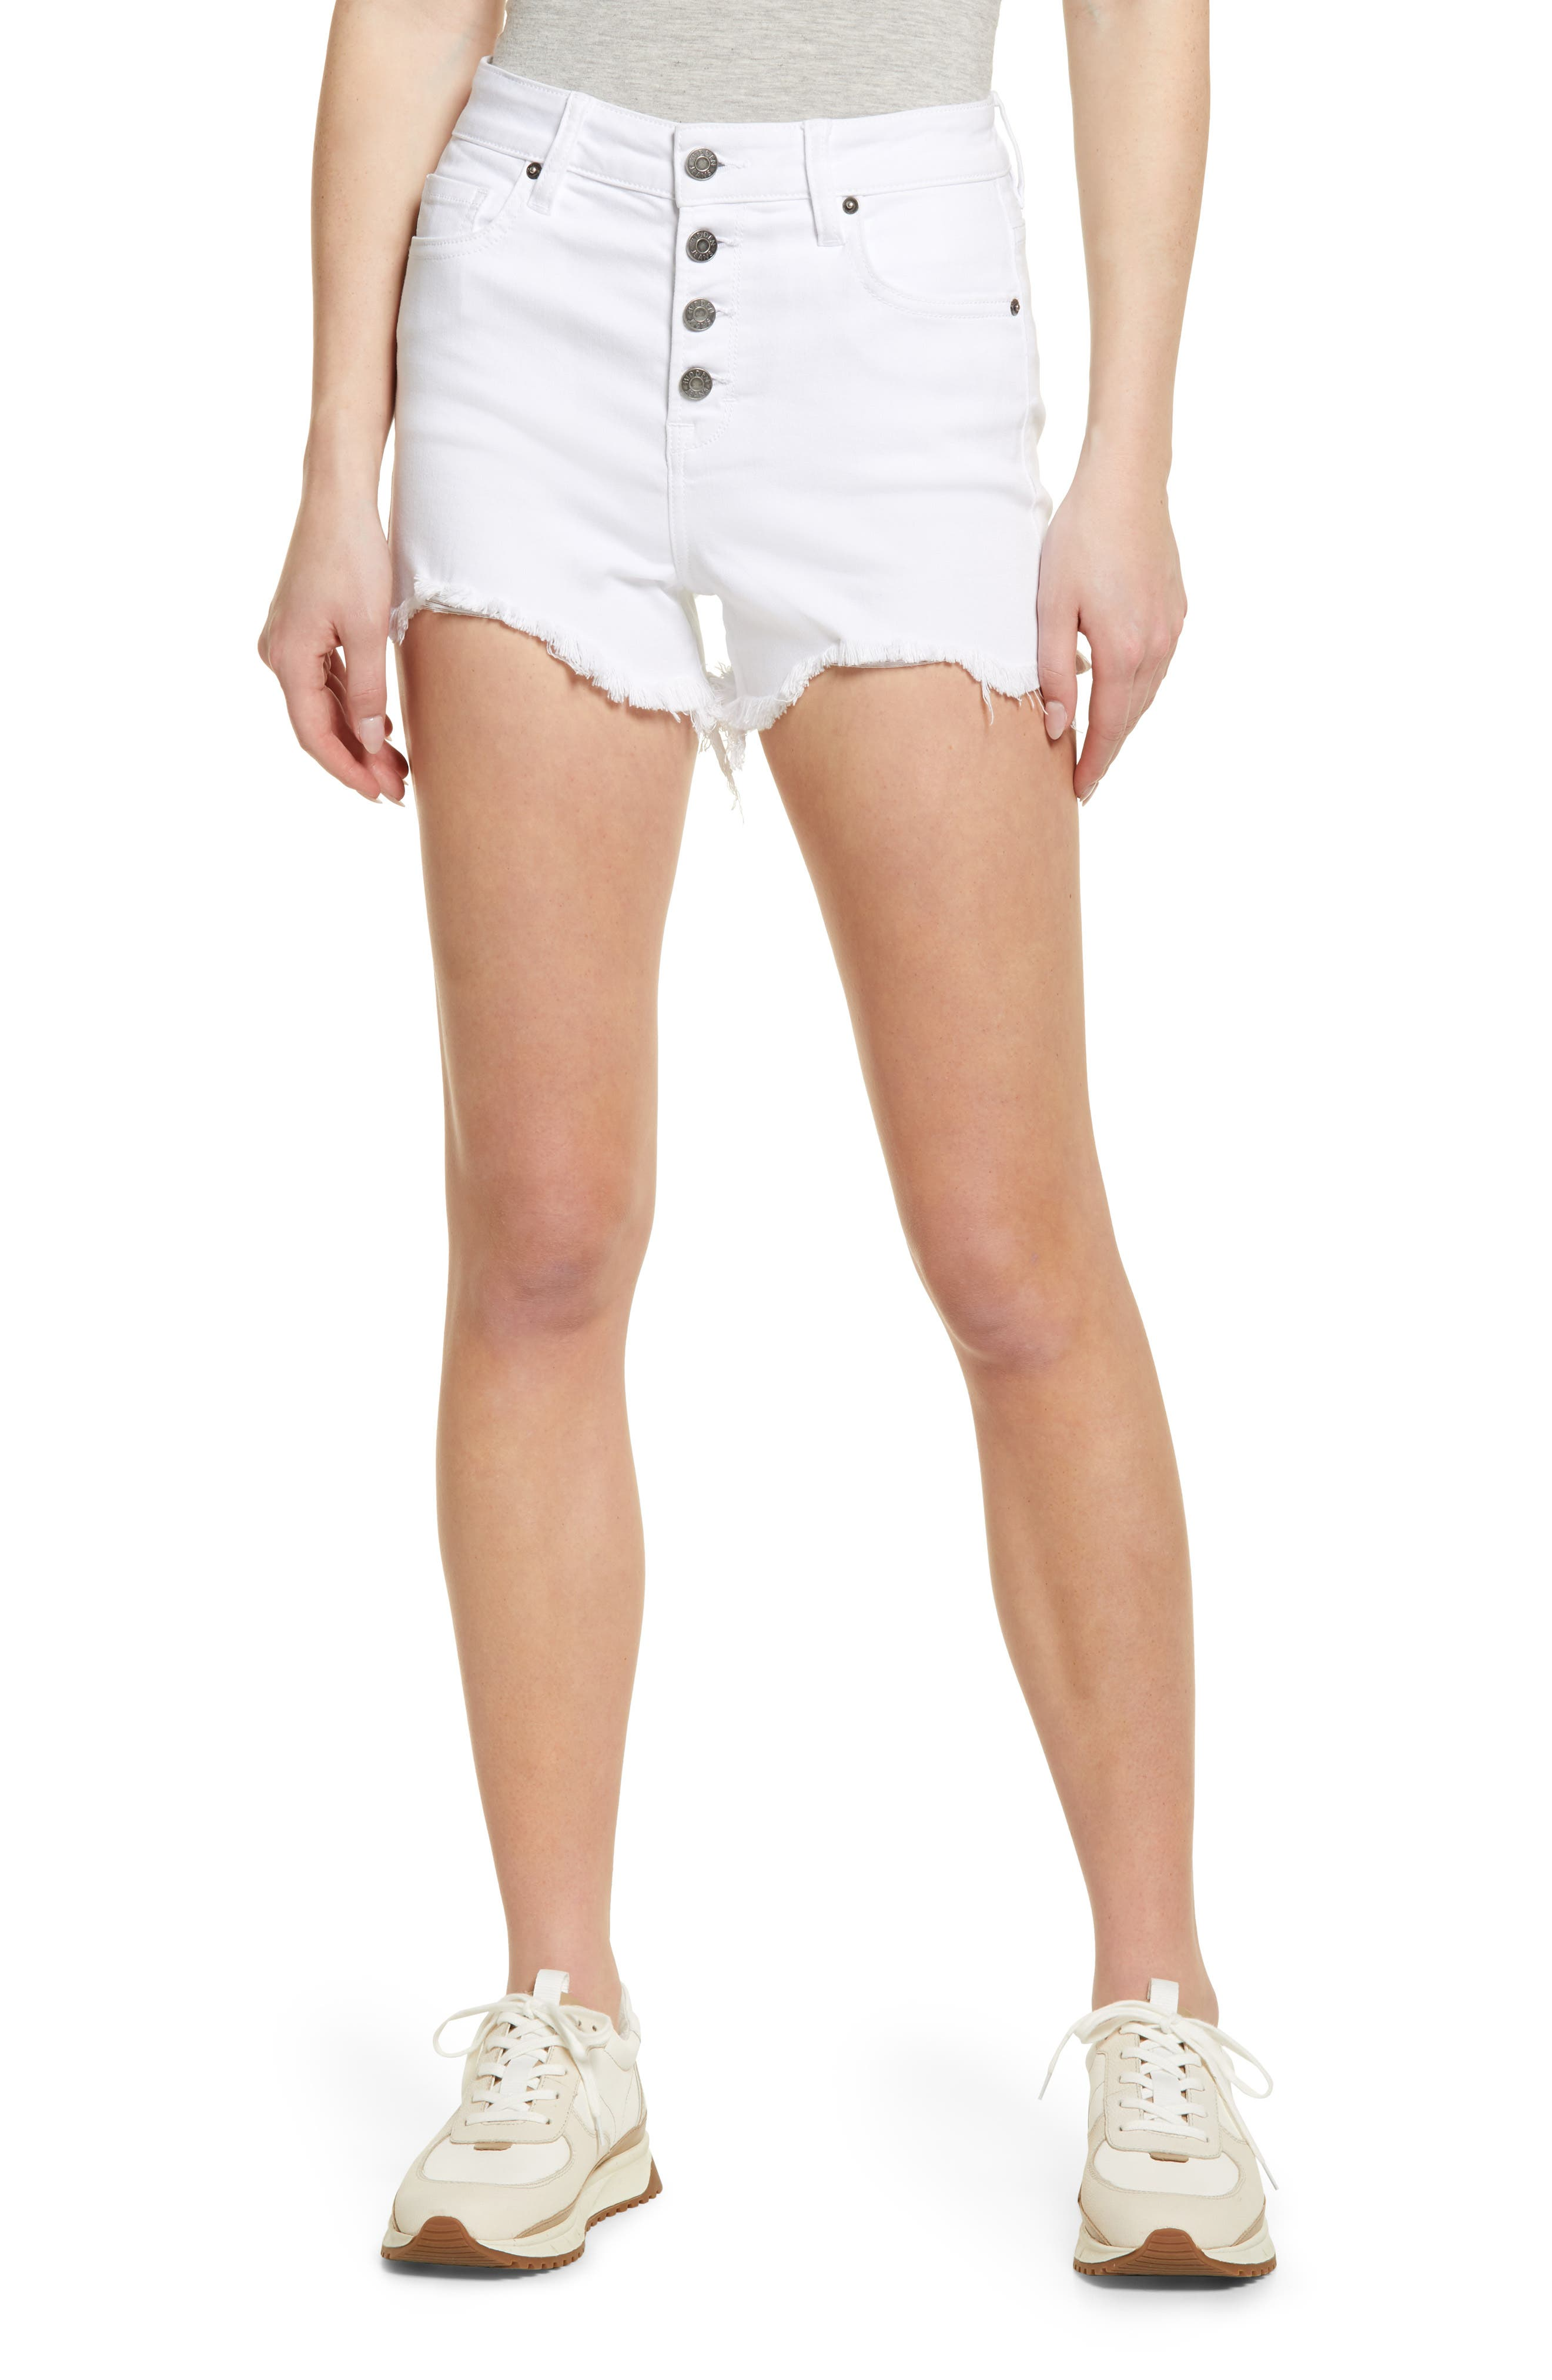 Button Fly High Waist Cutoff Mom Shorts